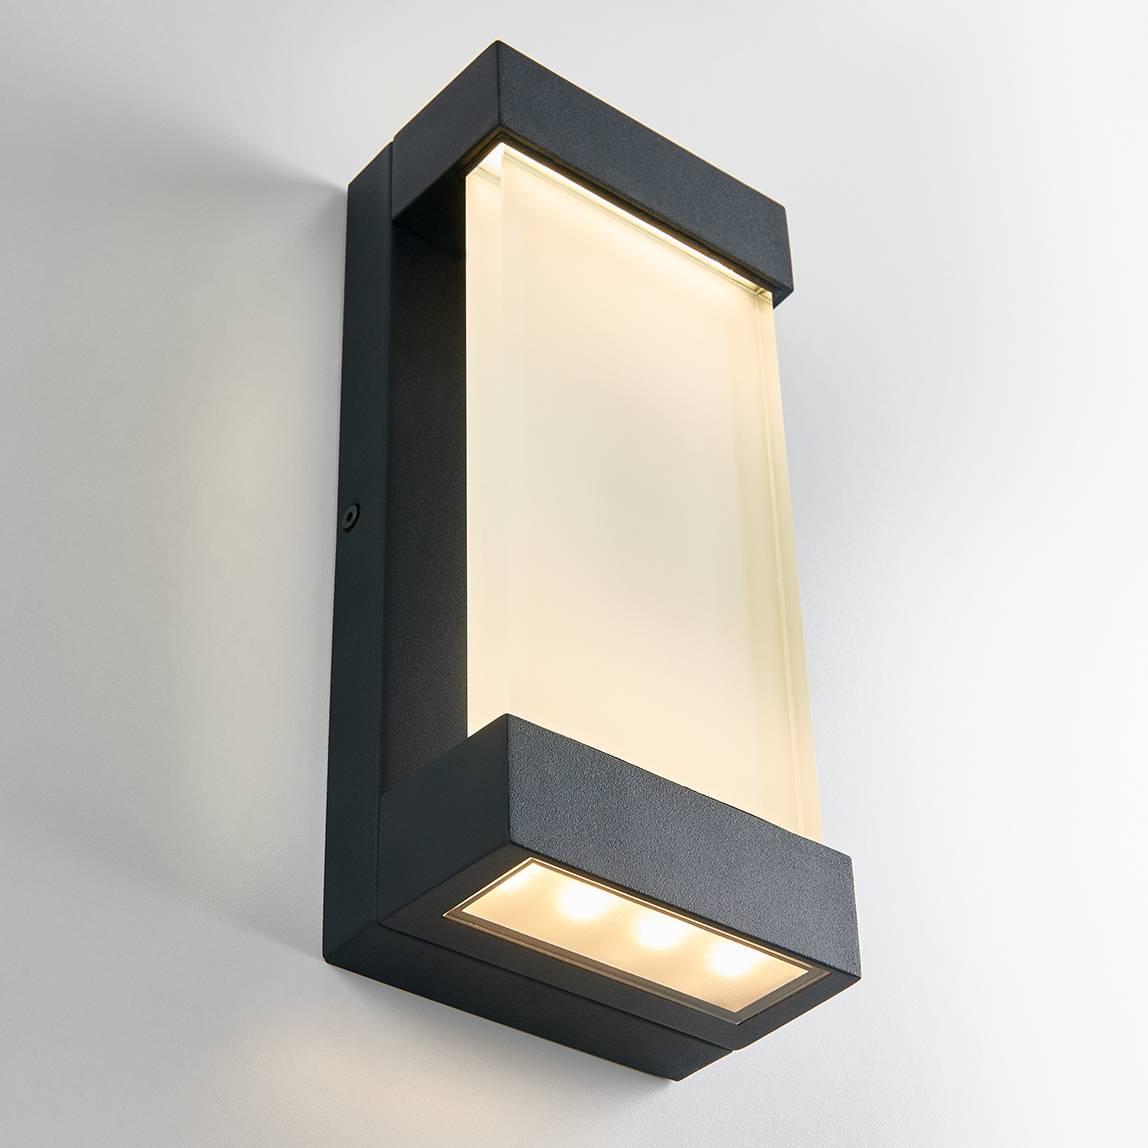 Glacier Black Integrated LED Outdoor Wall Light